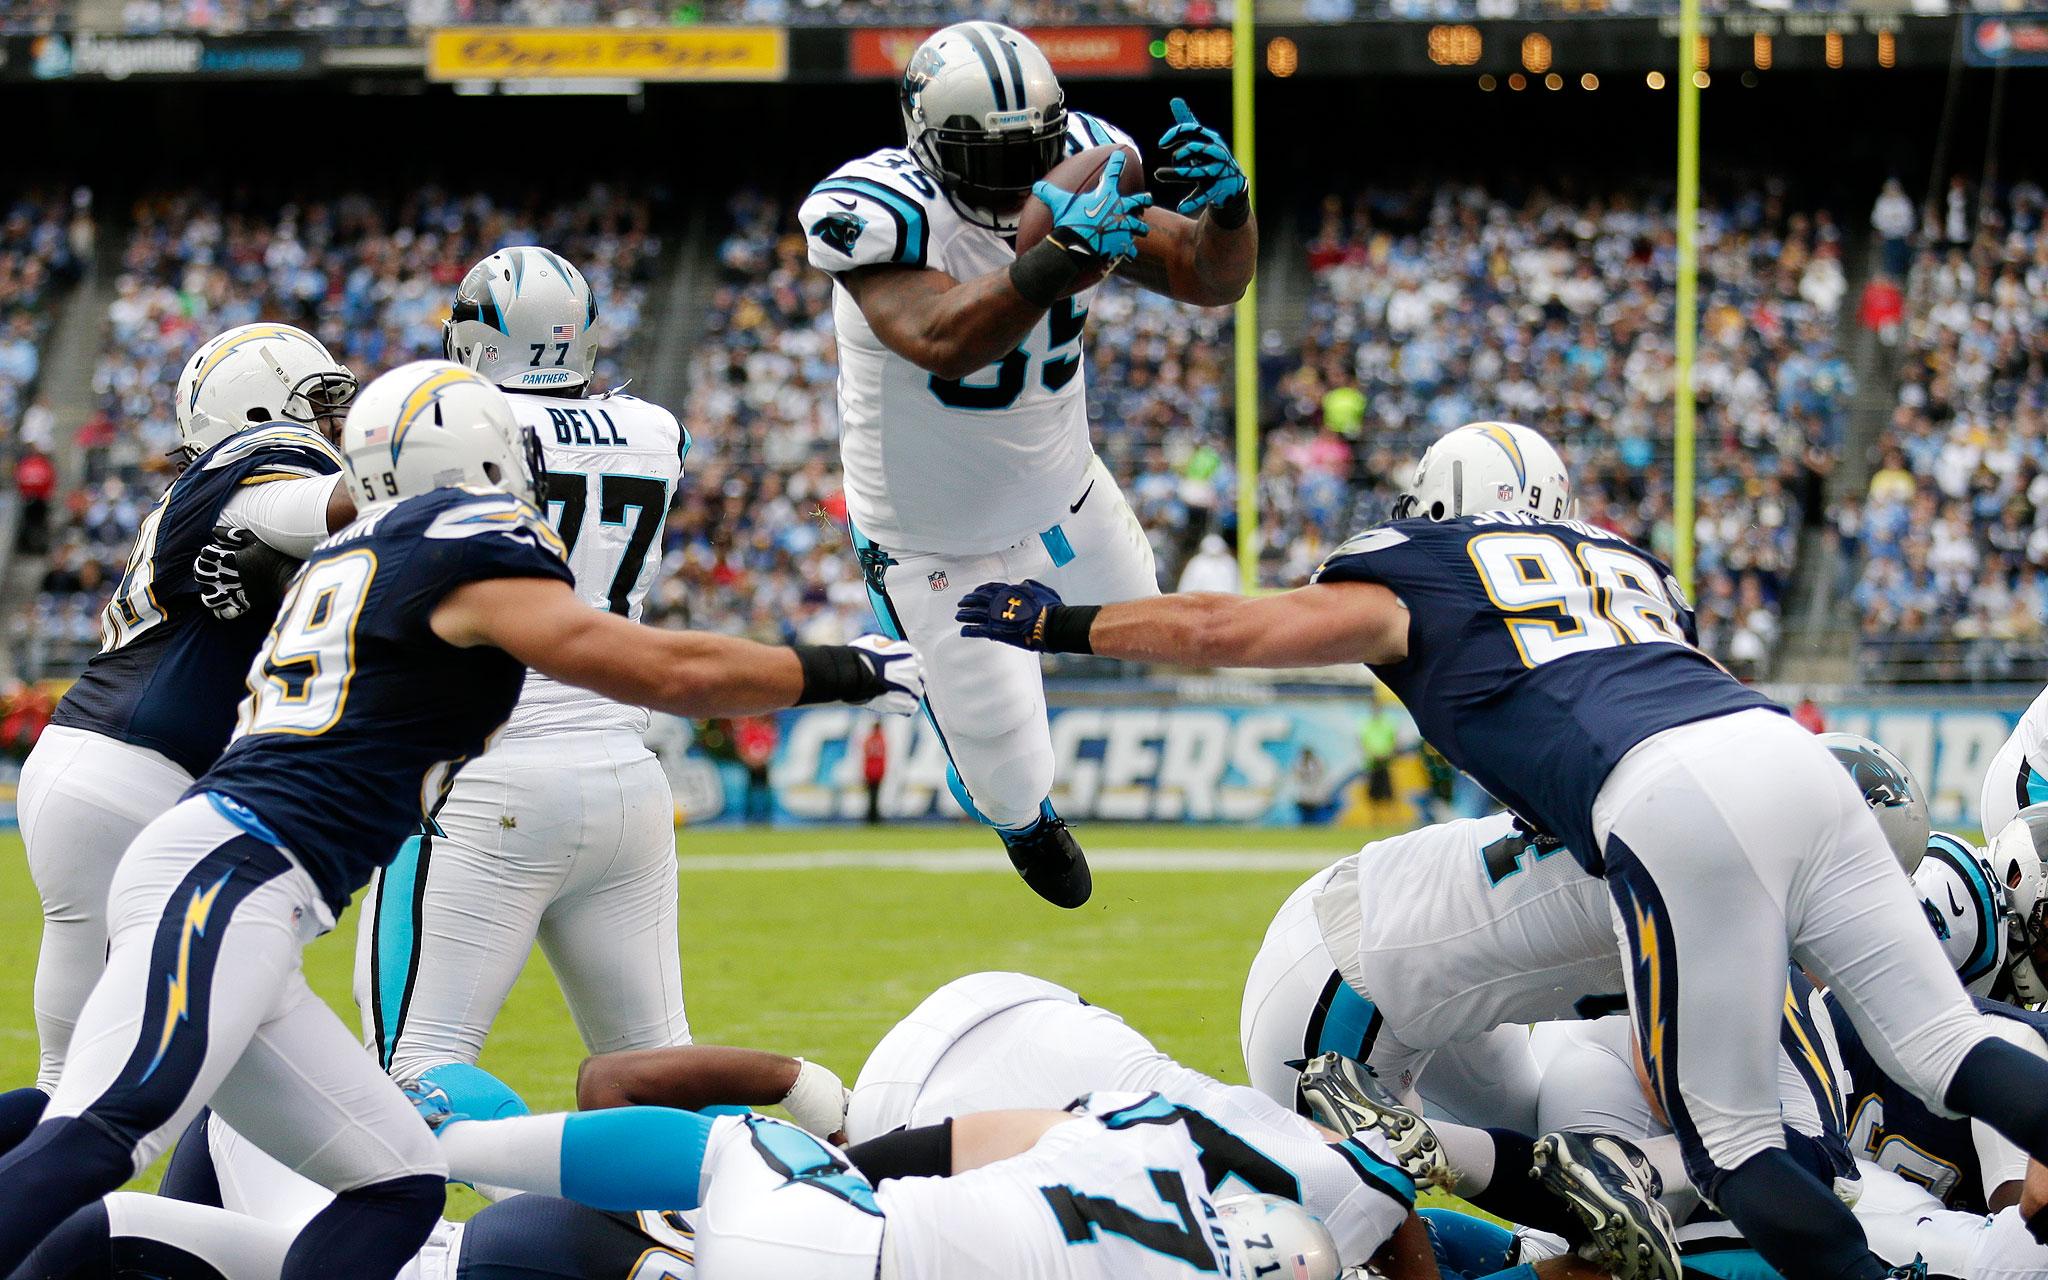 Football Wallpapers 23: NFL Power Rankings: Week 16 – The Acronym